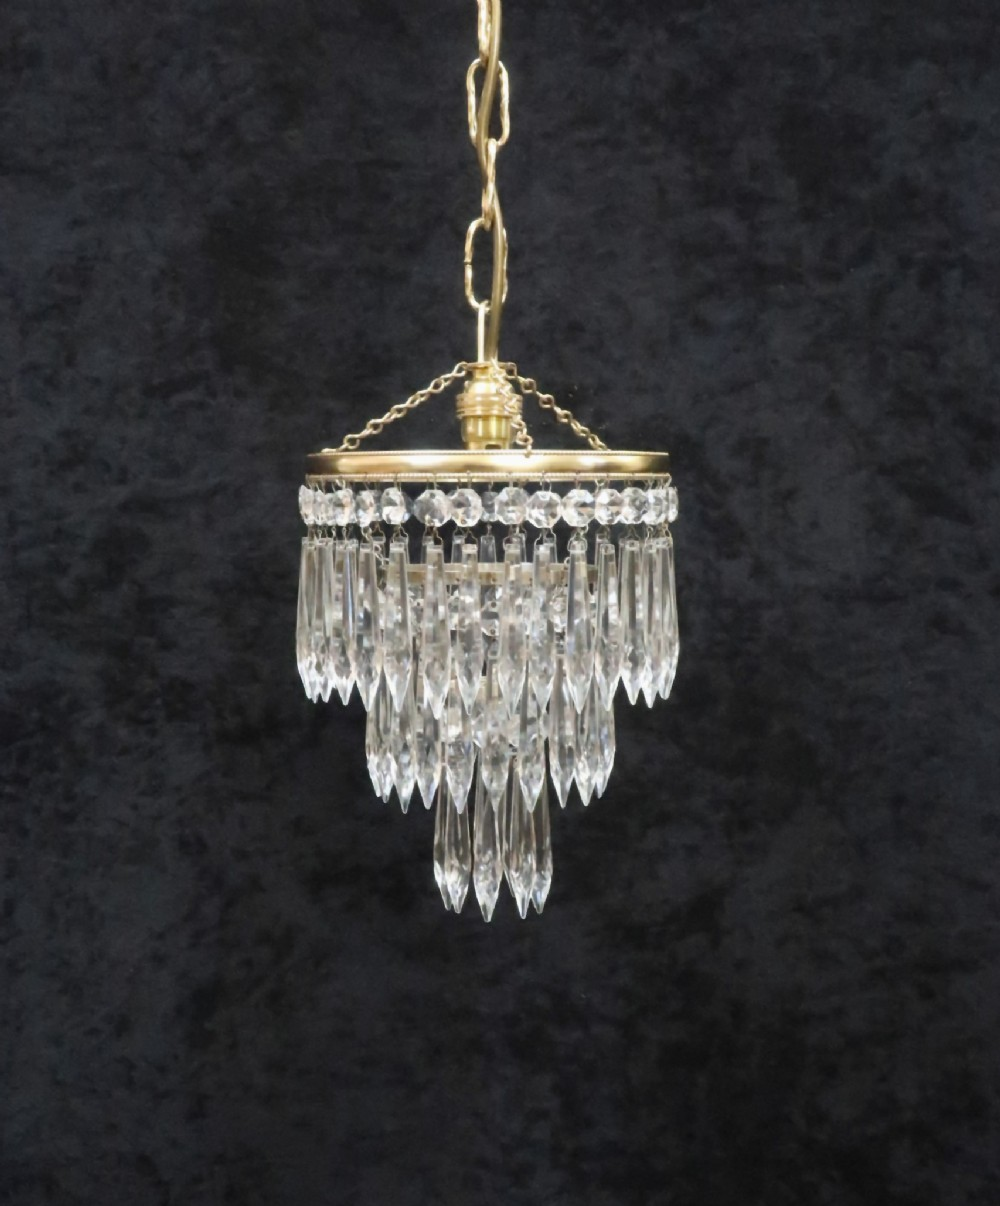 italian art deco three tier crystal glass chandelier